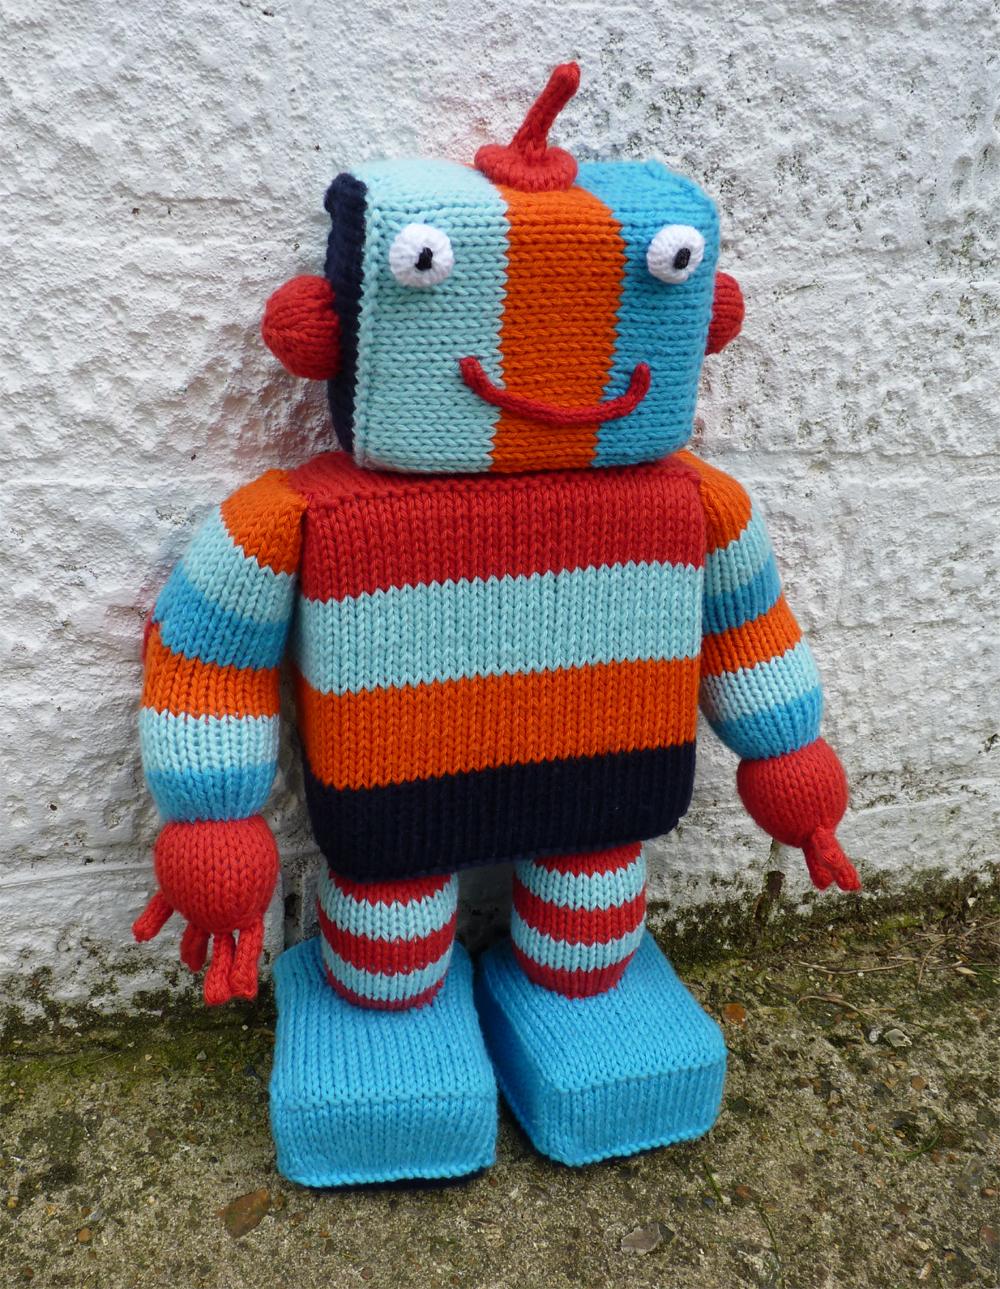 Little Cotton Rabbits: mr Ro-bot